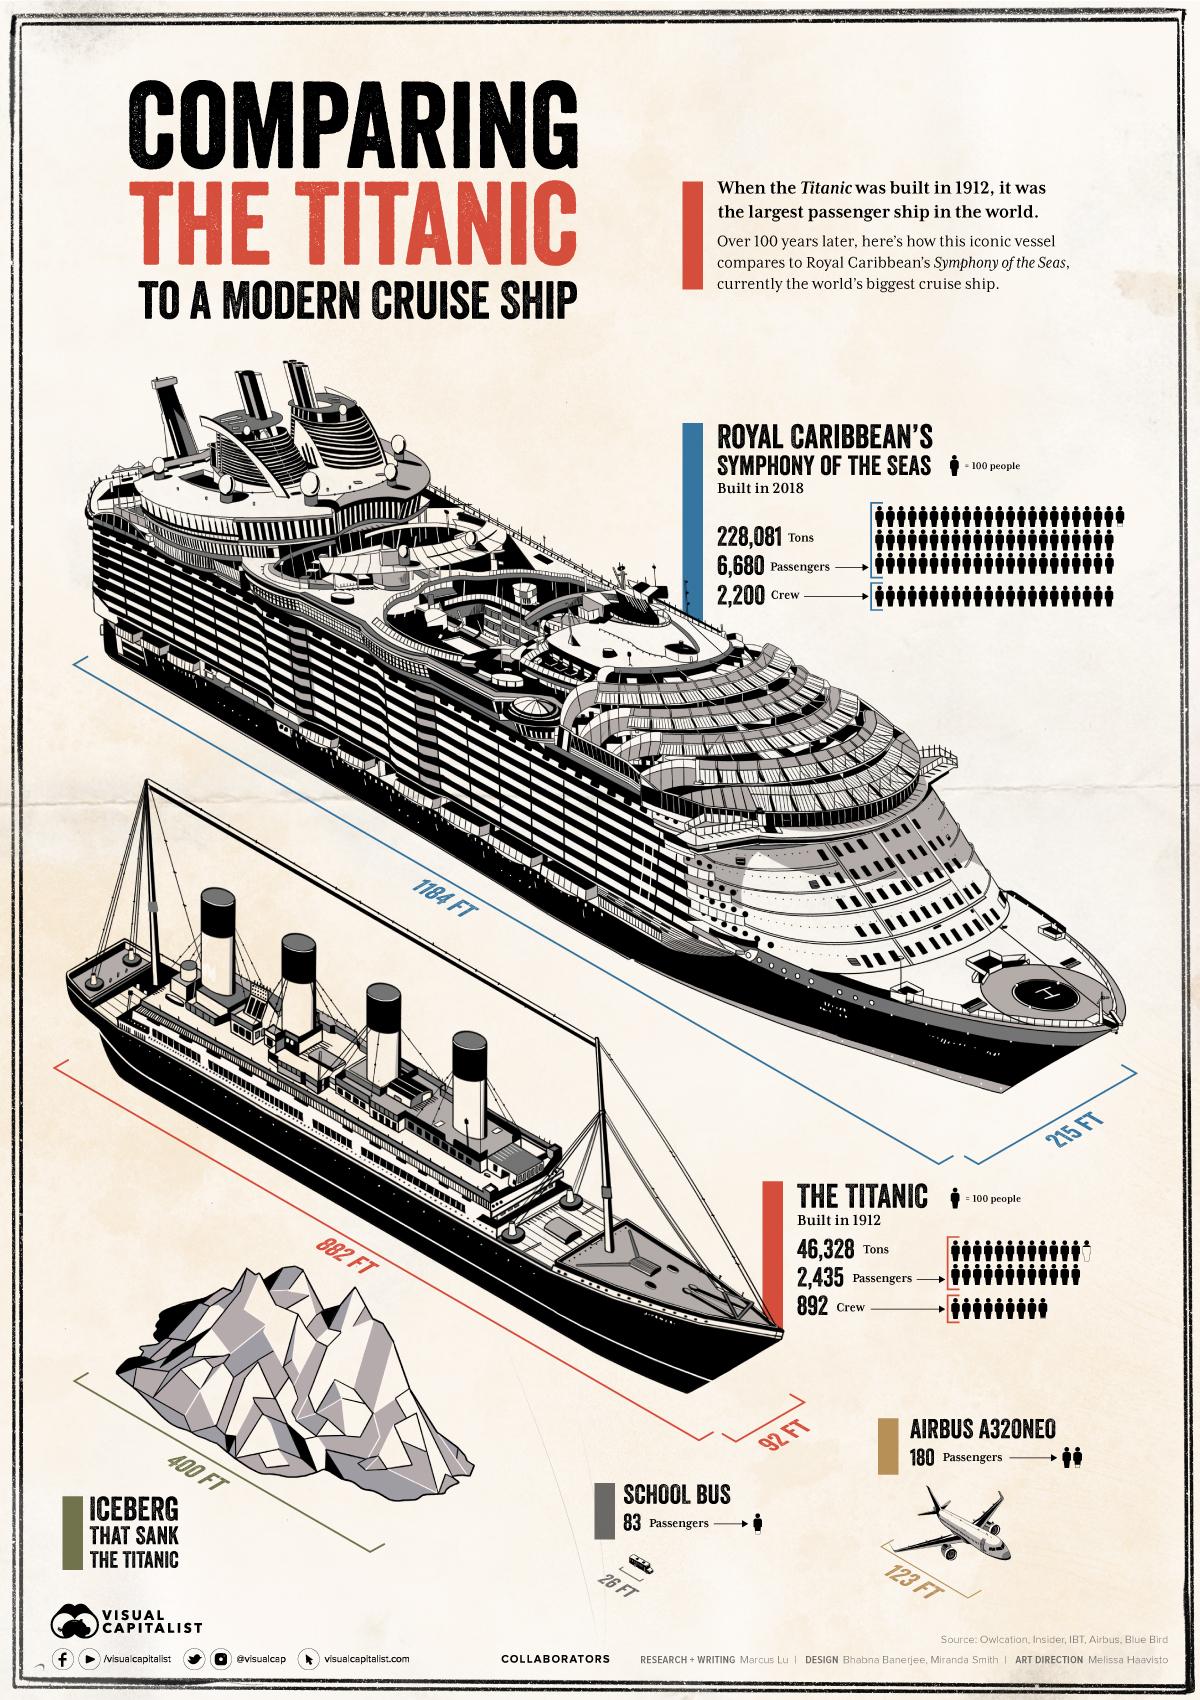 DataViz History: Comparing the Titanic to a Modern Cruise Ship